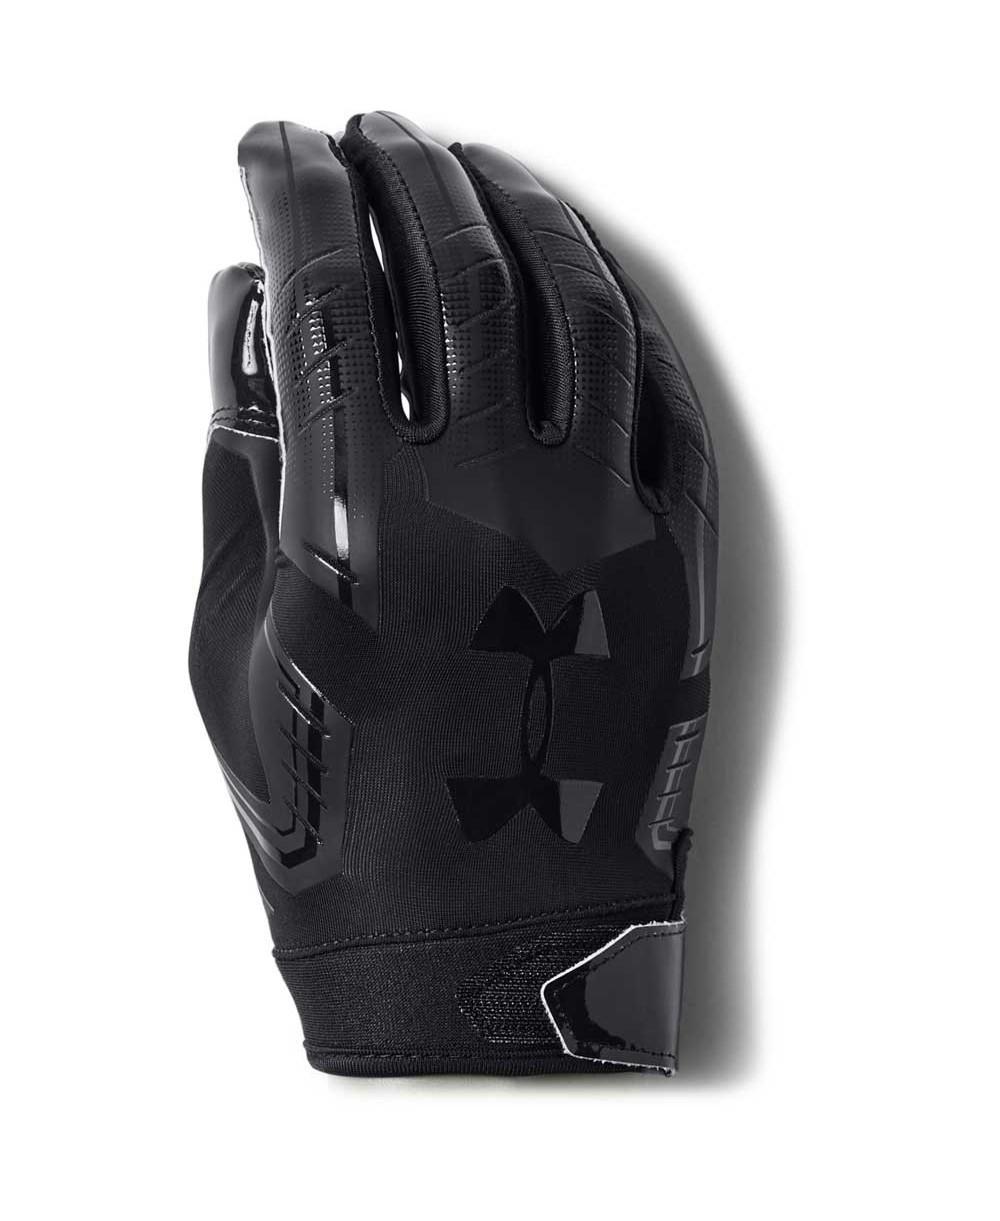 Under Armour F6 Men s American Football Gloves Black 3854fb06d6